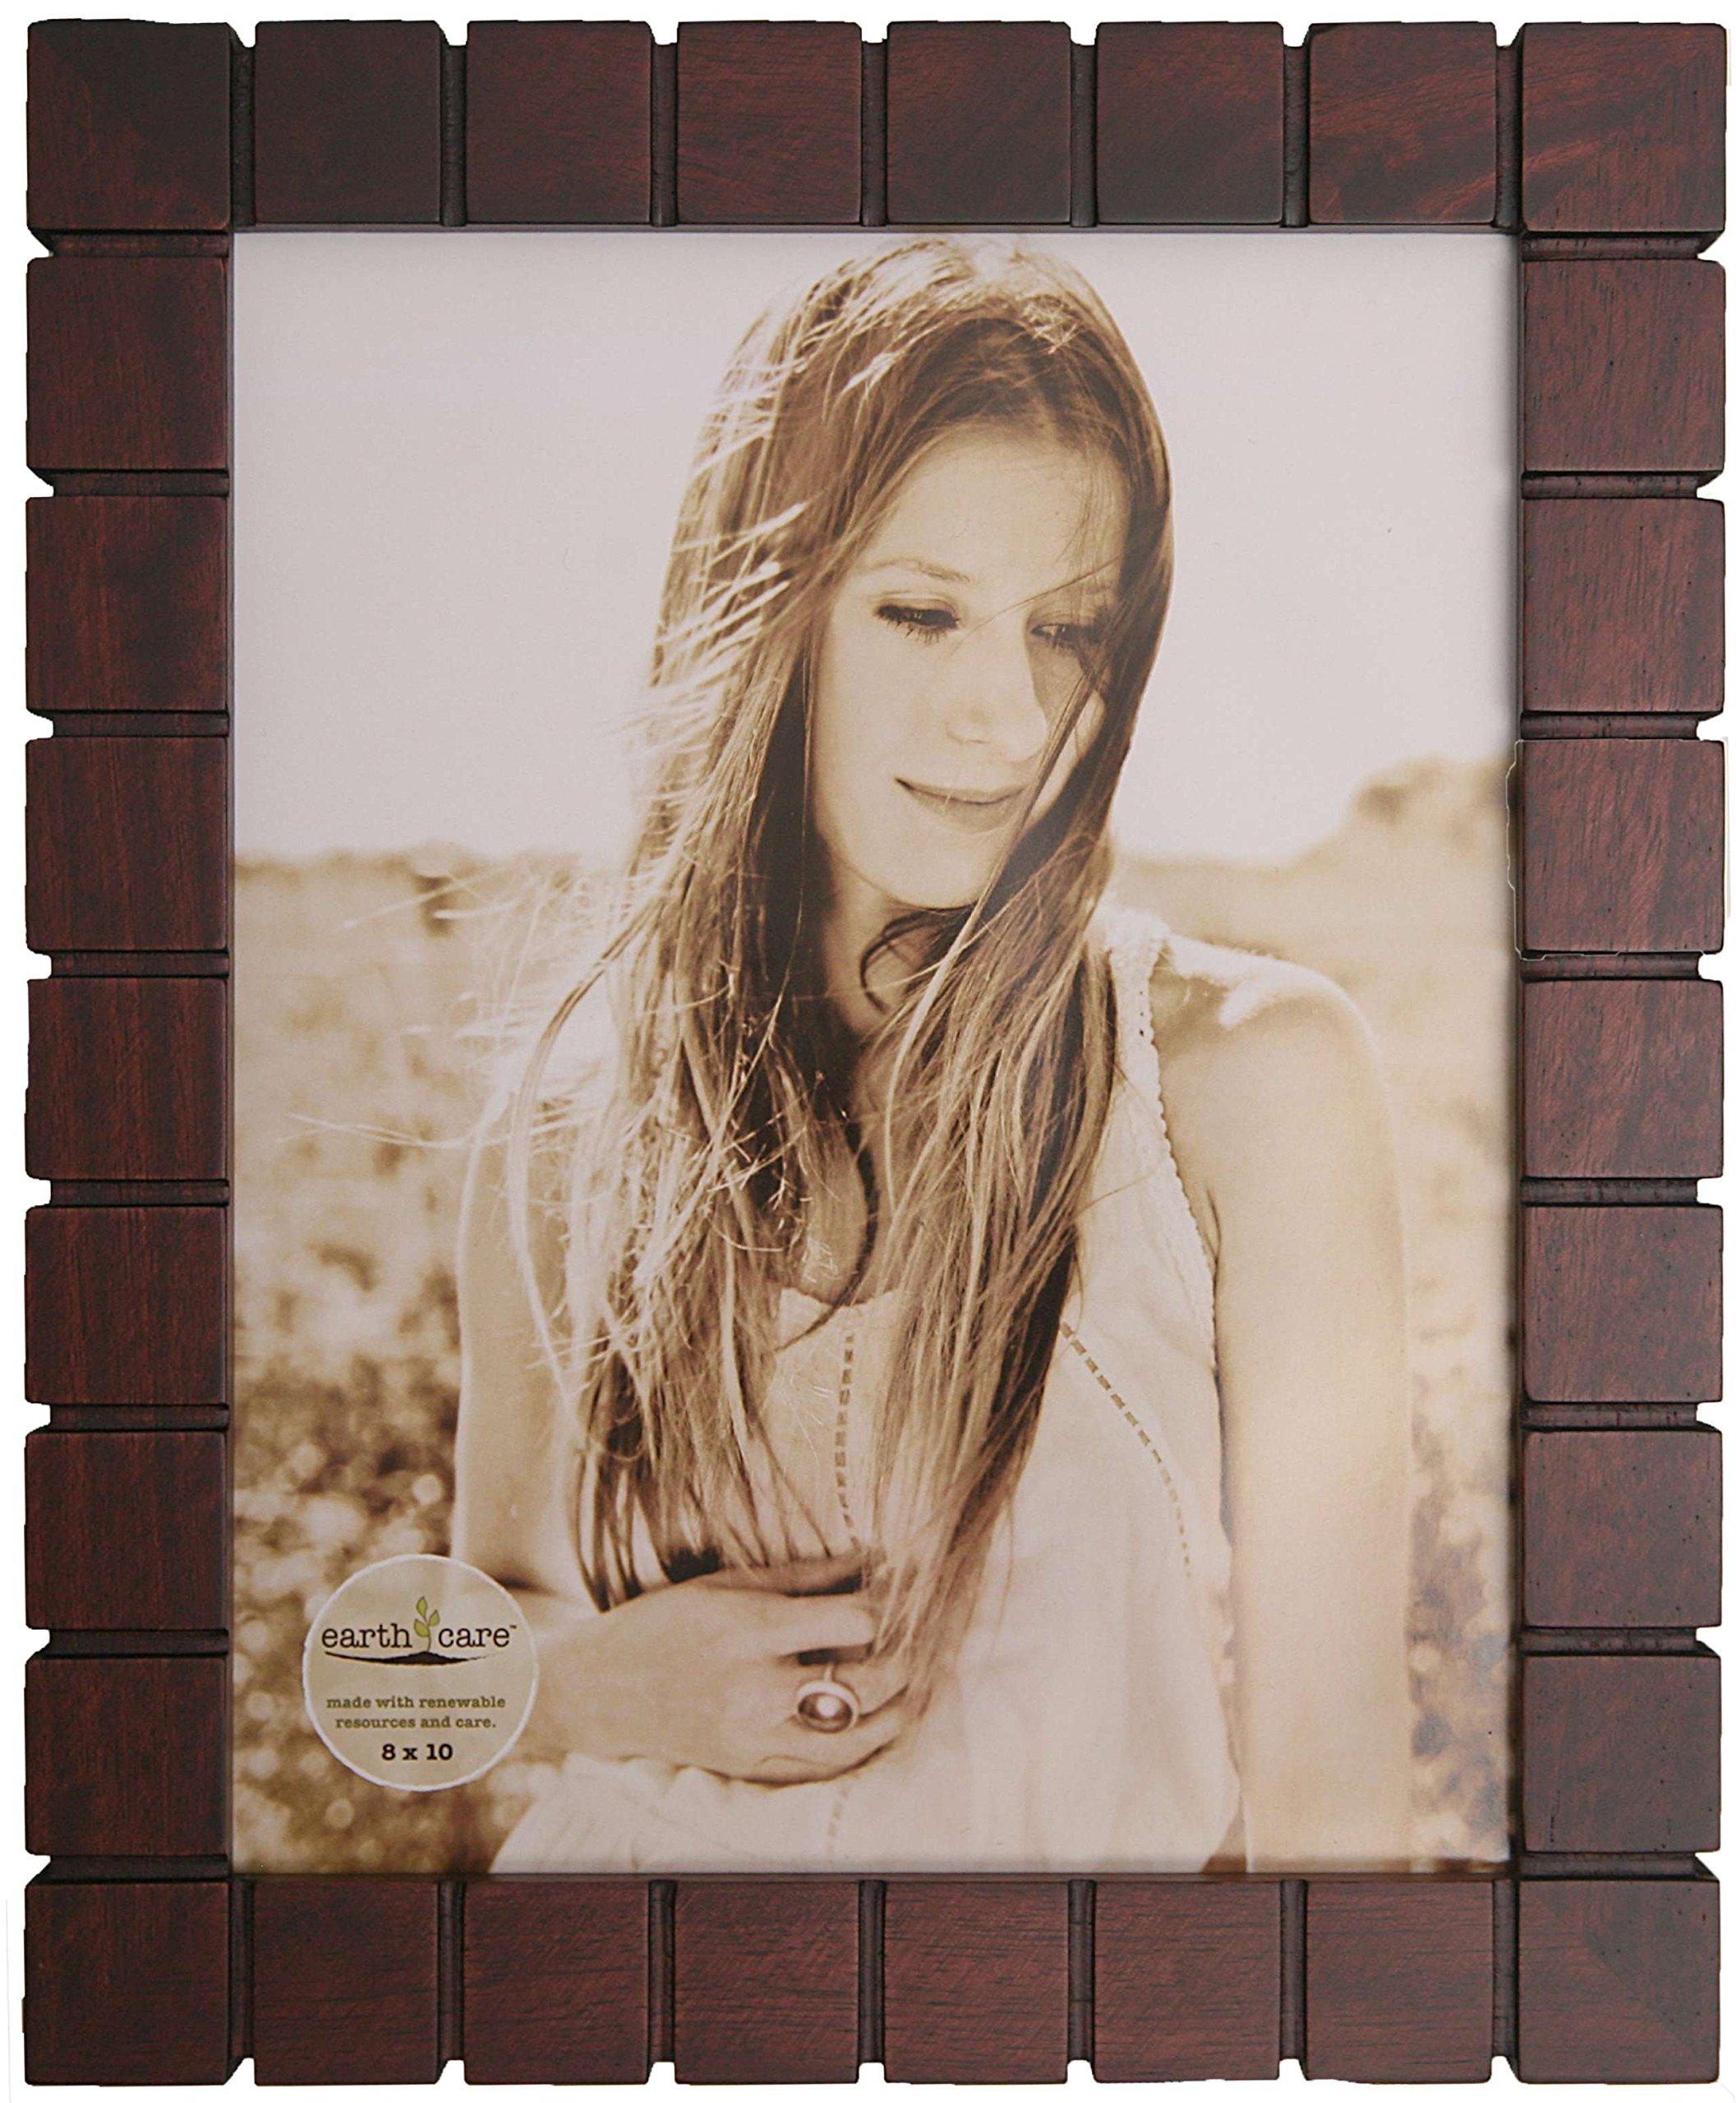 Cheap Cardboard Photo Frames 8x10, find Cardboard Photo Frames 8x10 ...